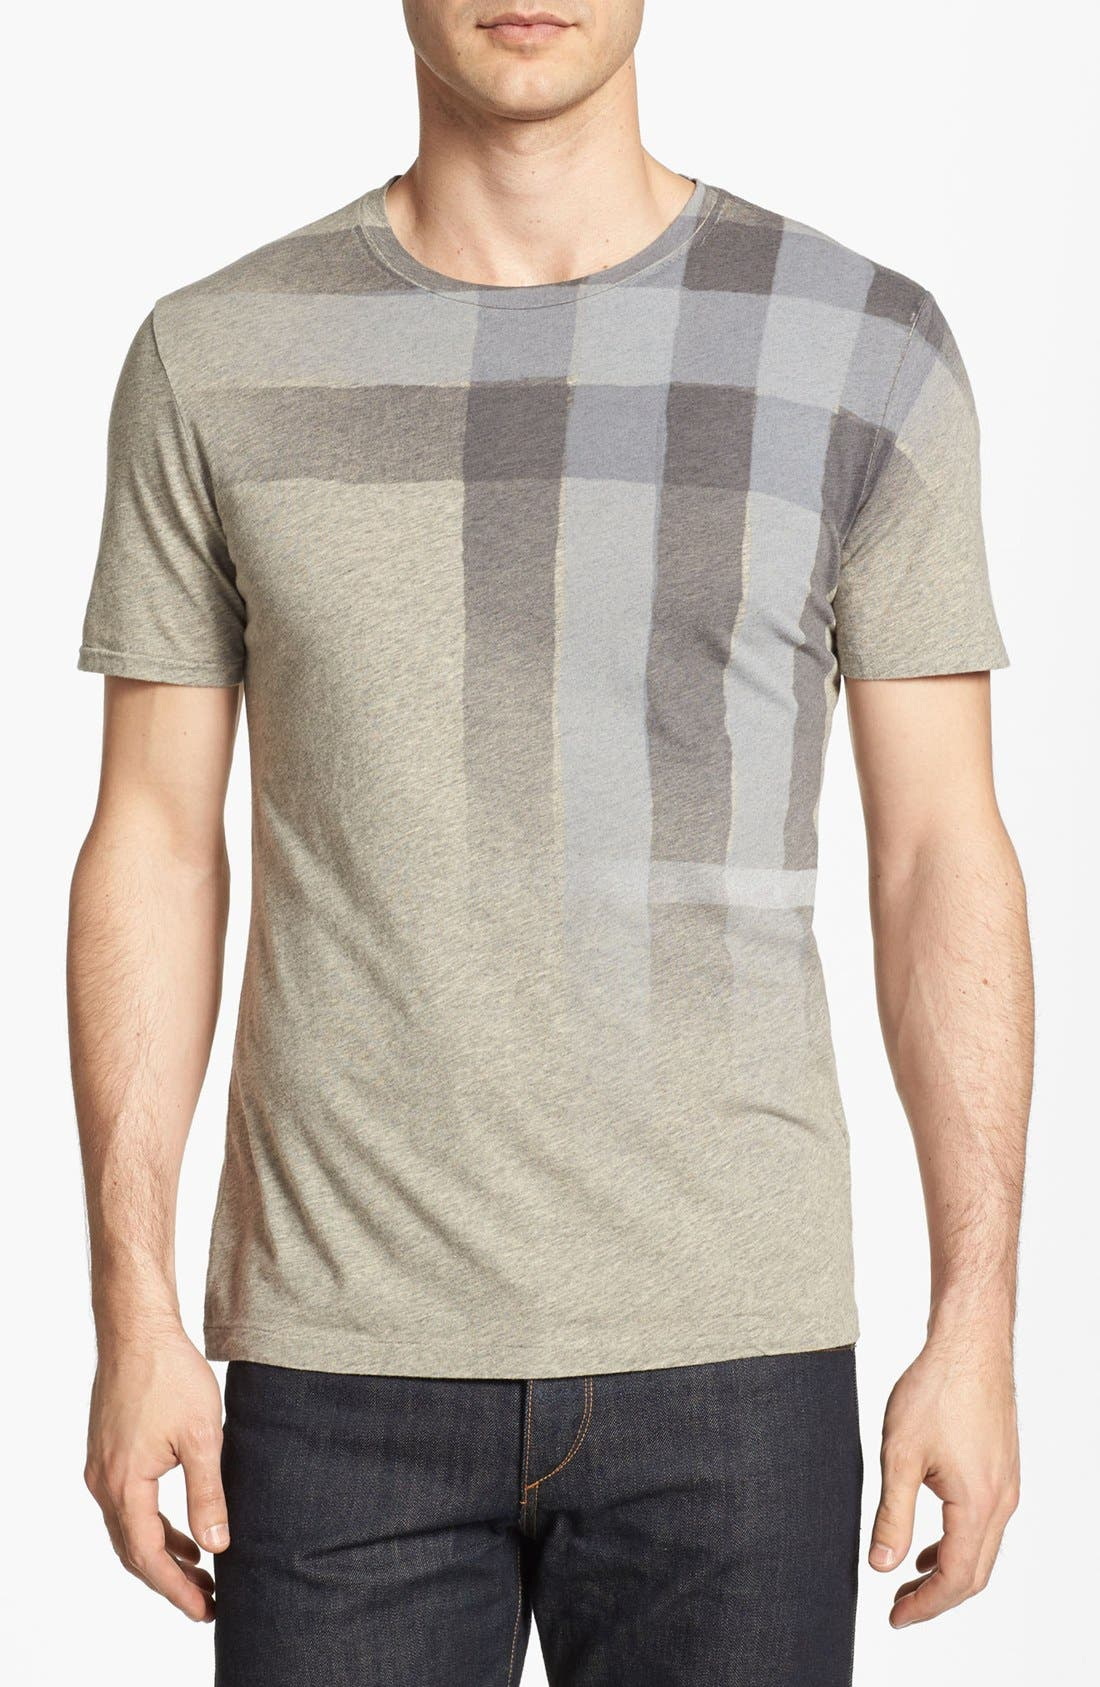 Main Image - Burberry Brit 'Eburne' Waterprint Check T-Shirt